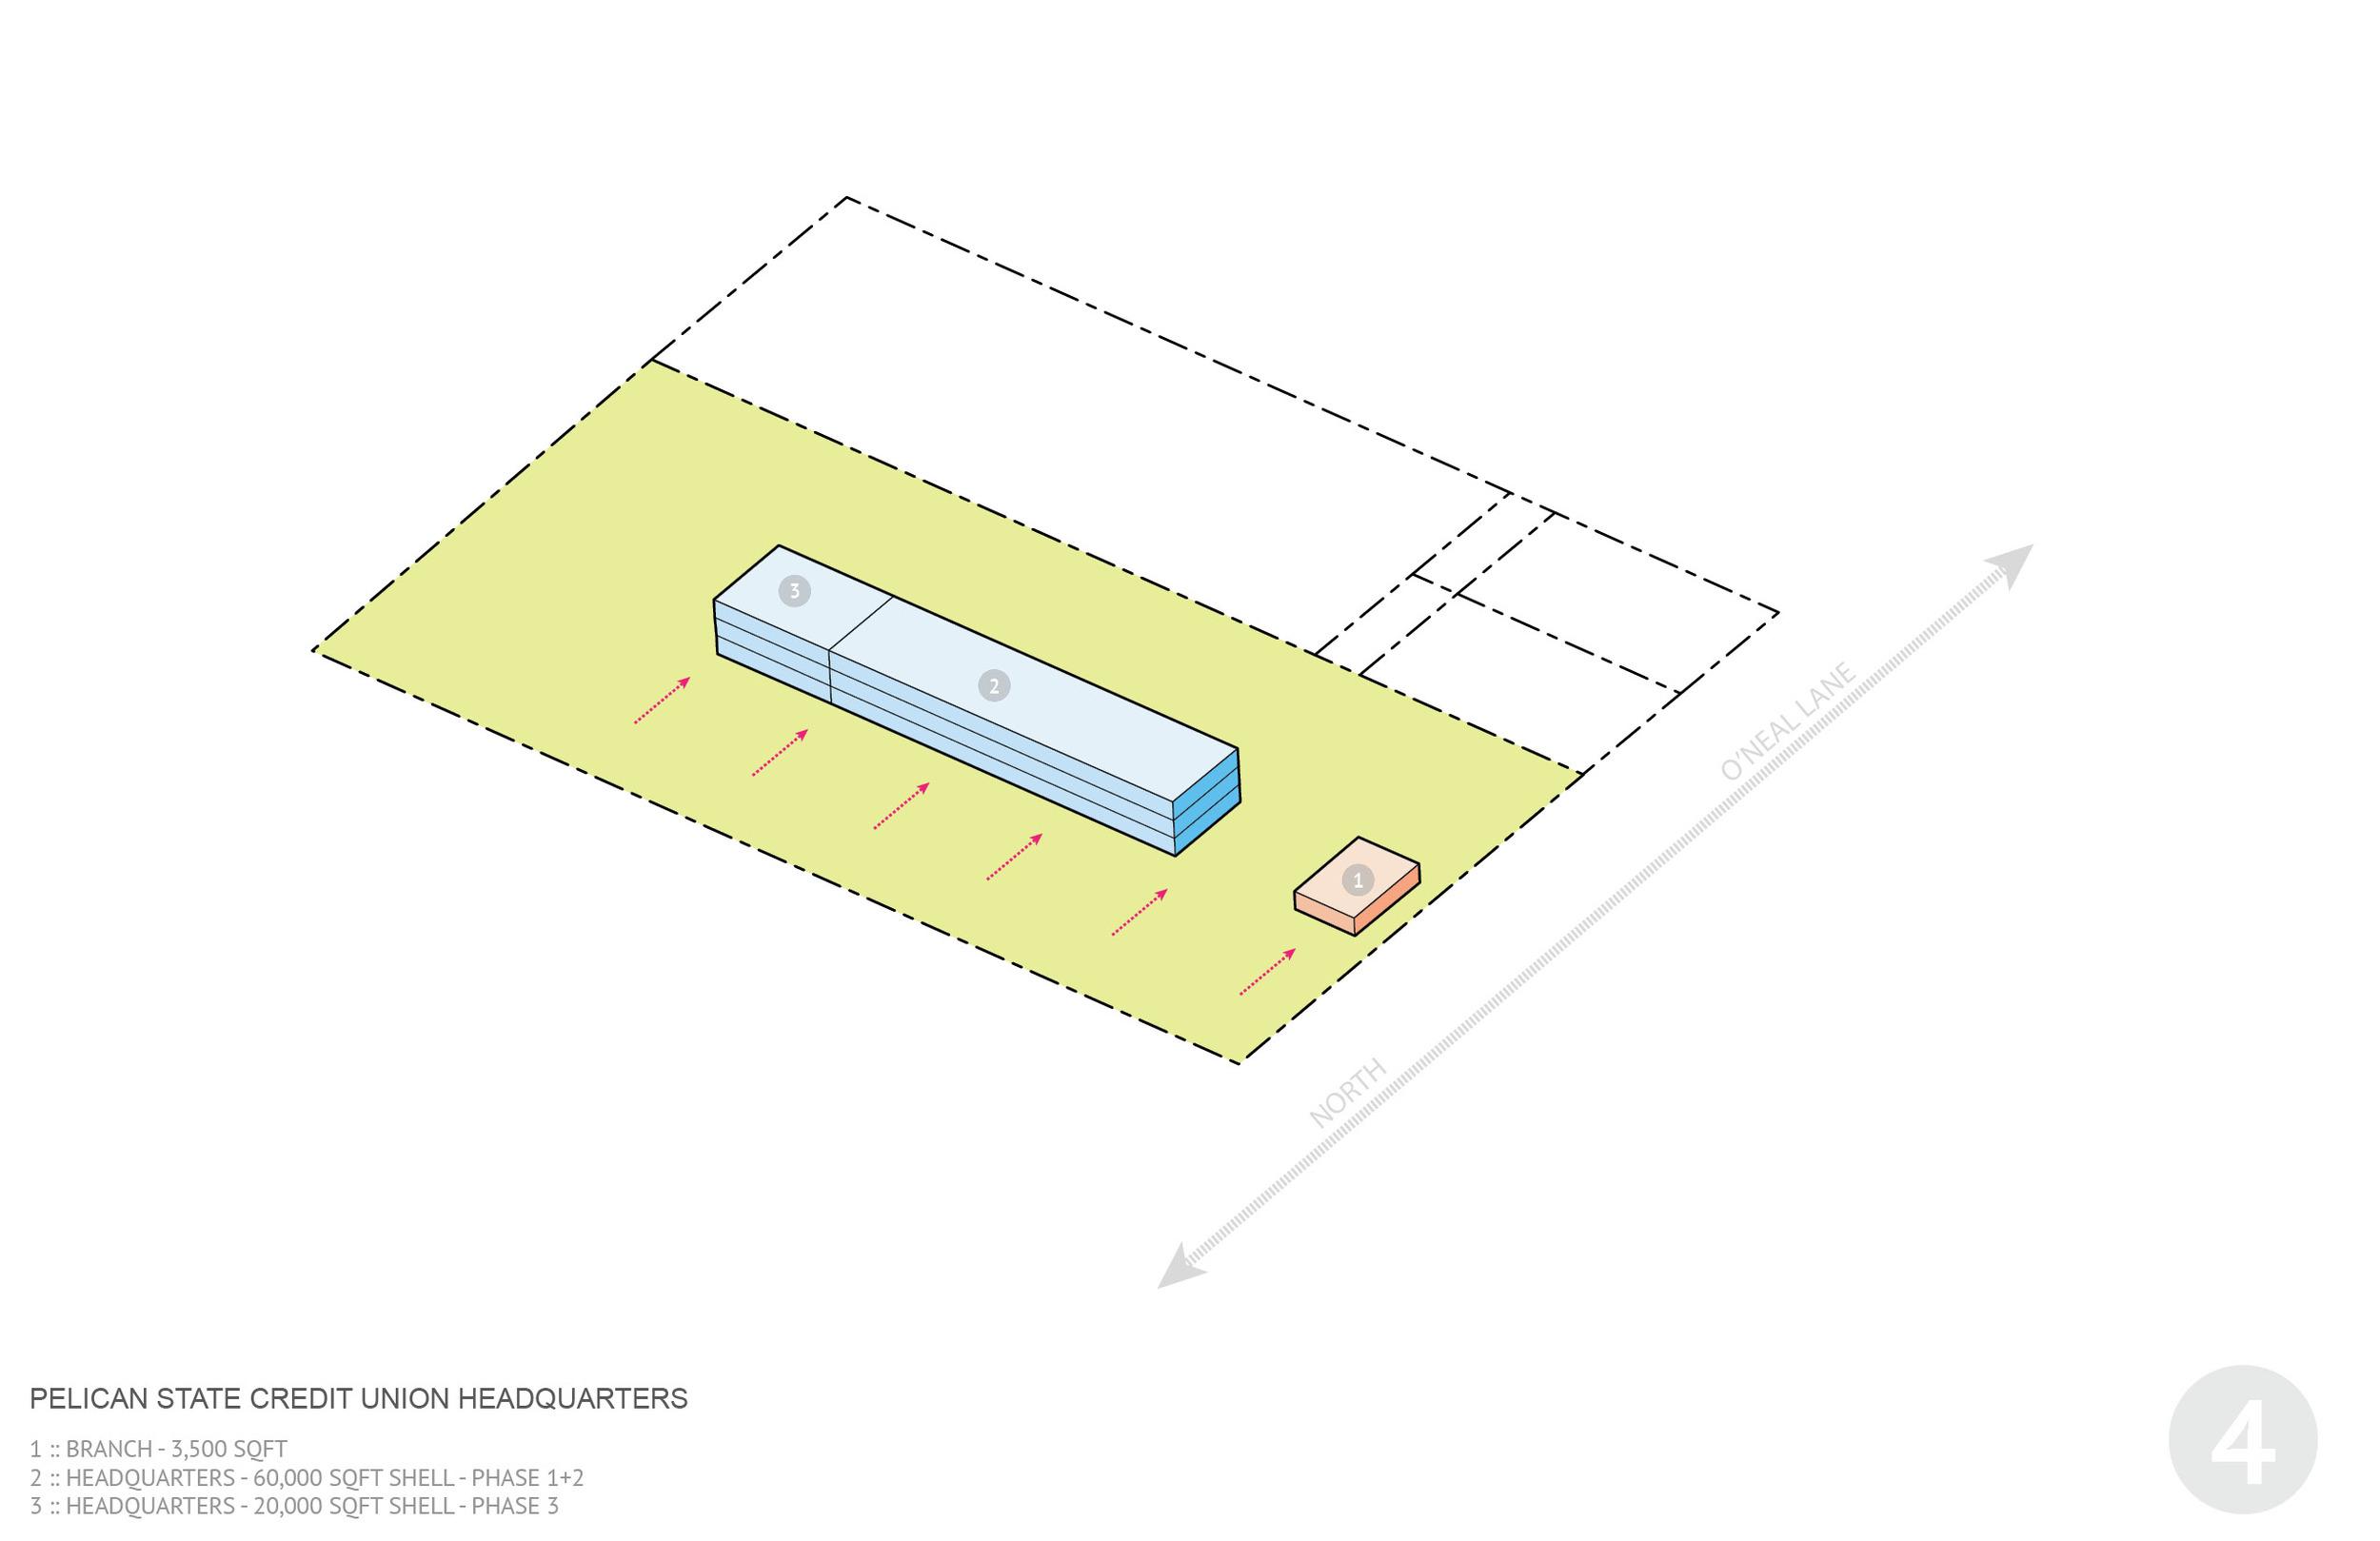 A_SlideshowDiagram_4.jpg